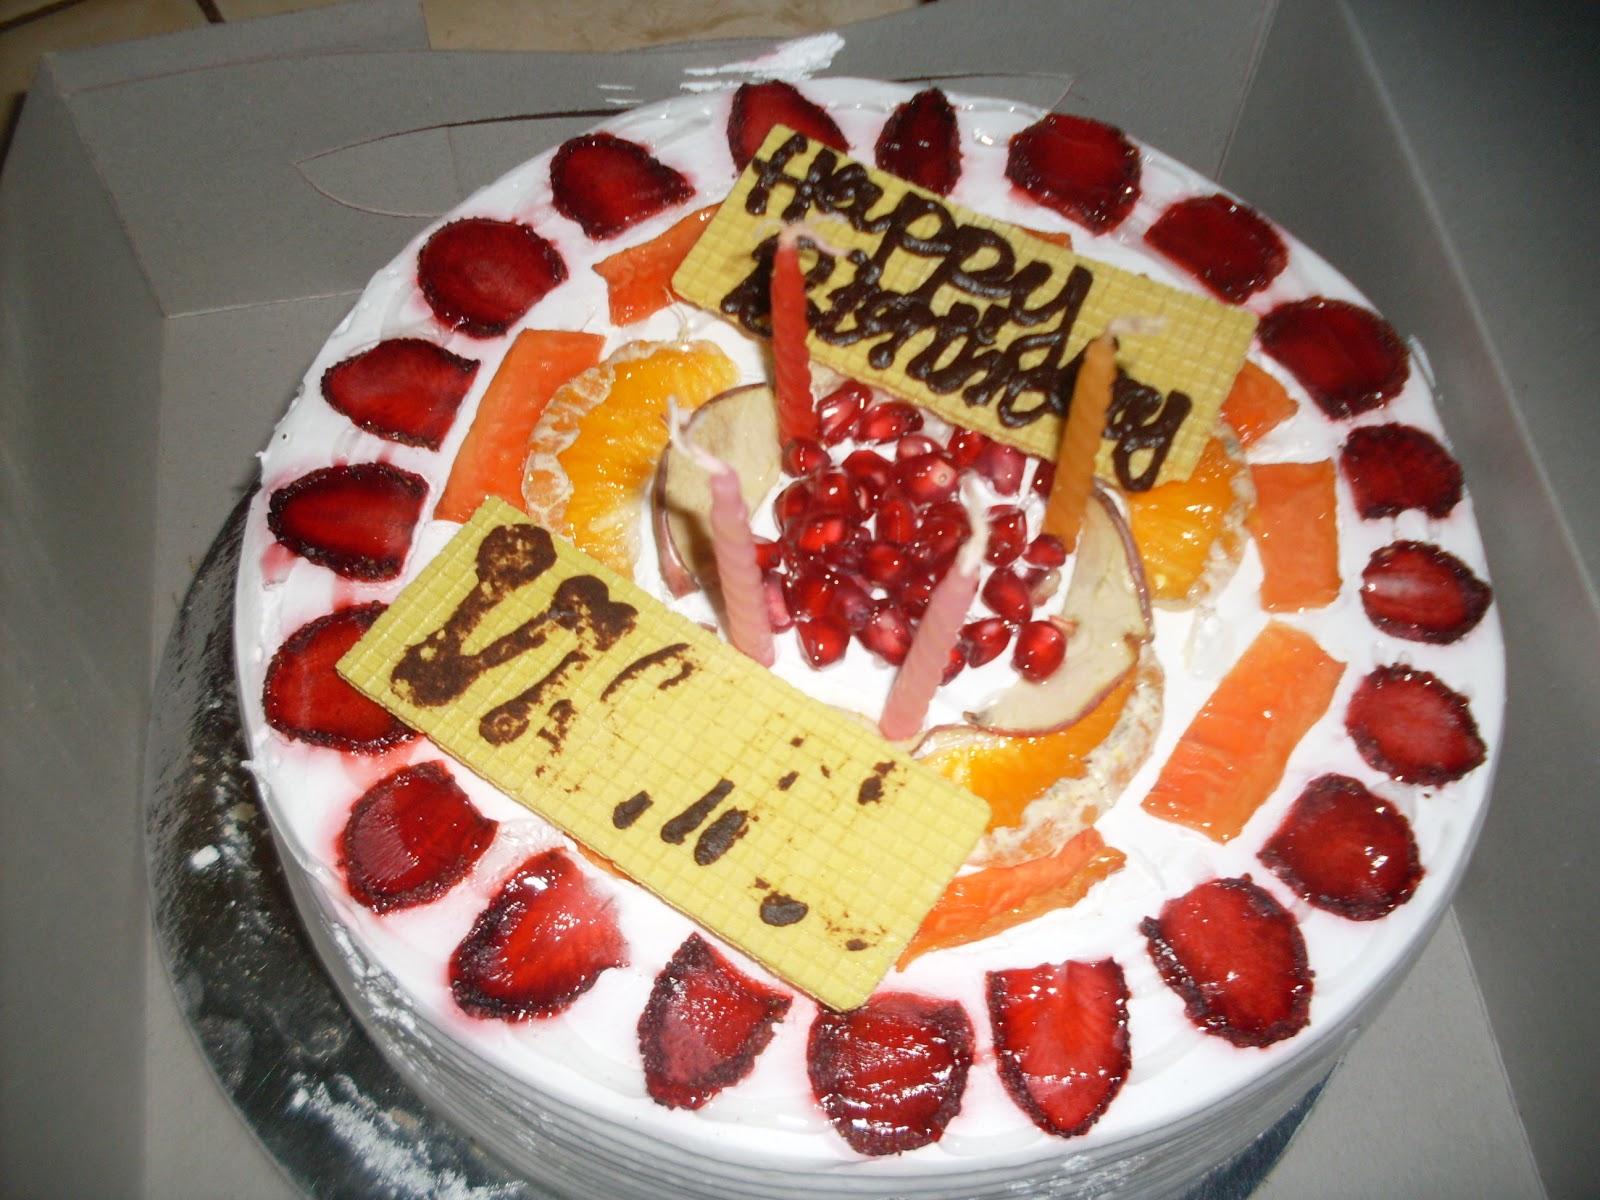 Birthday Cake Image Vishal : WELCOME To VISHAL s BLOGSPHERE: BIRTHDAY MARCH 20 : THE ...